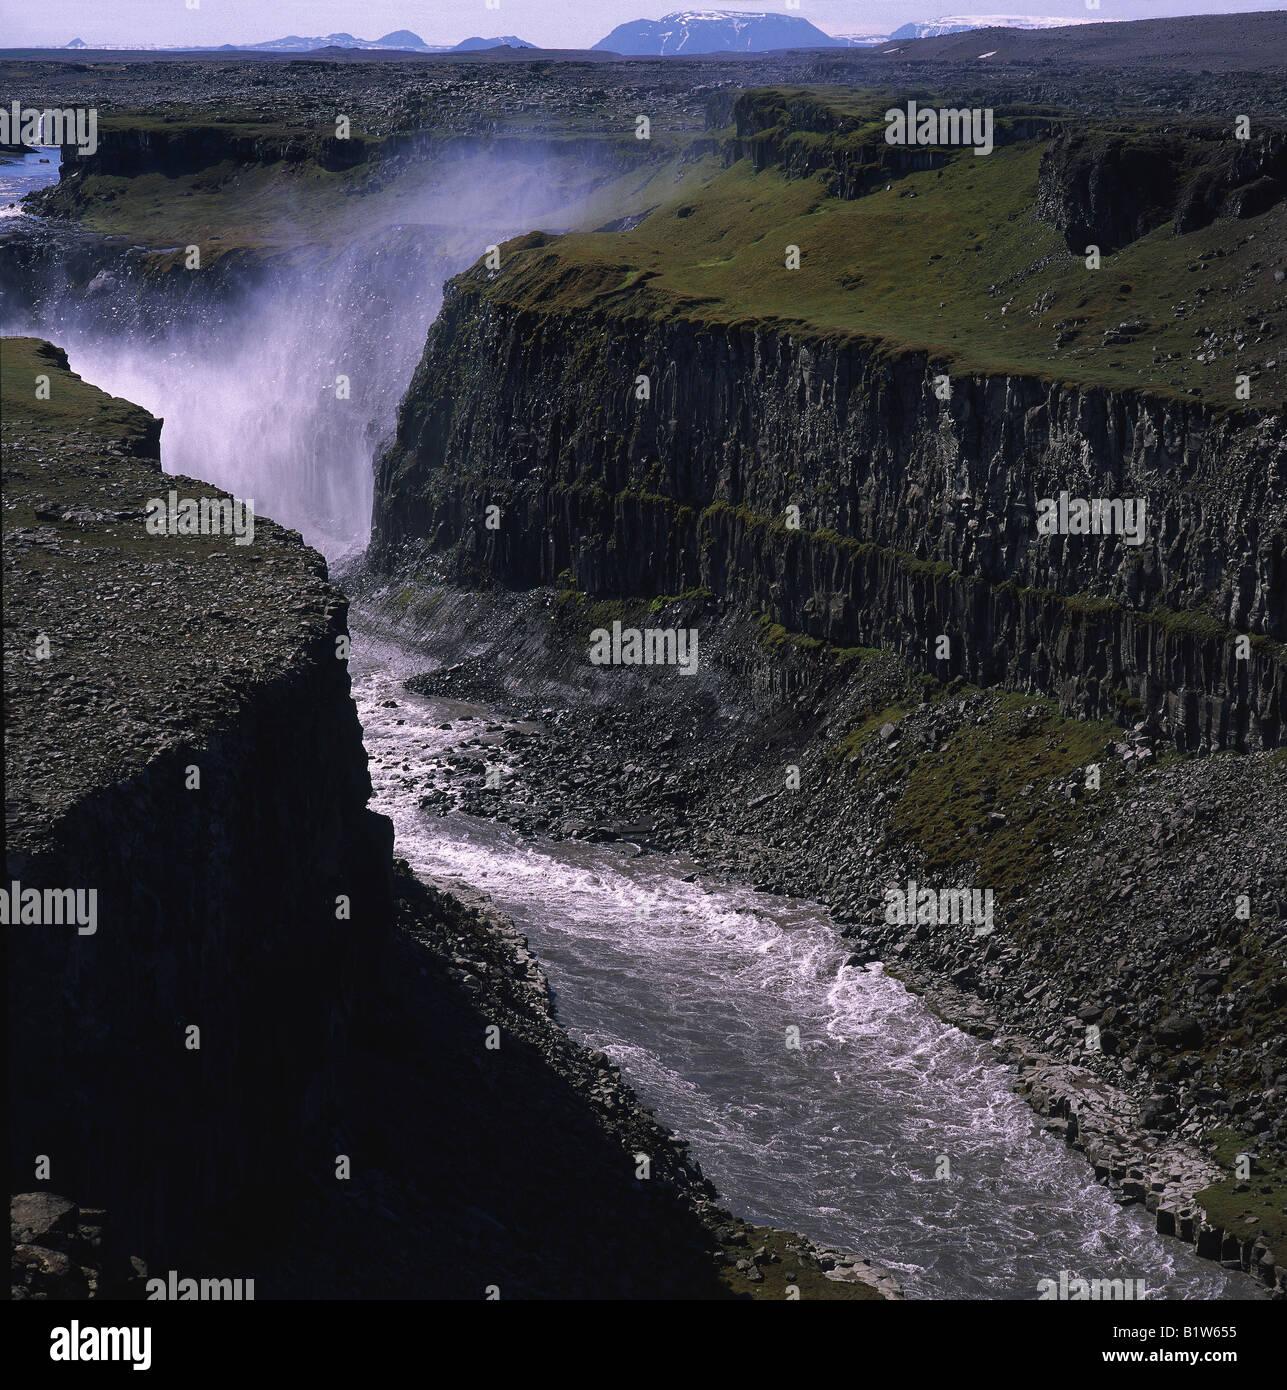 Dettifoss Waterfall and Jokulsargljufur Canyon, Iceland - Stock Image